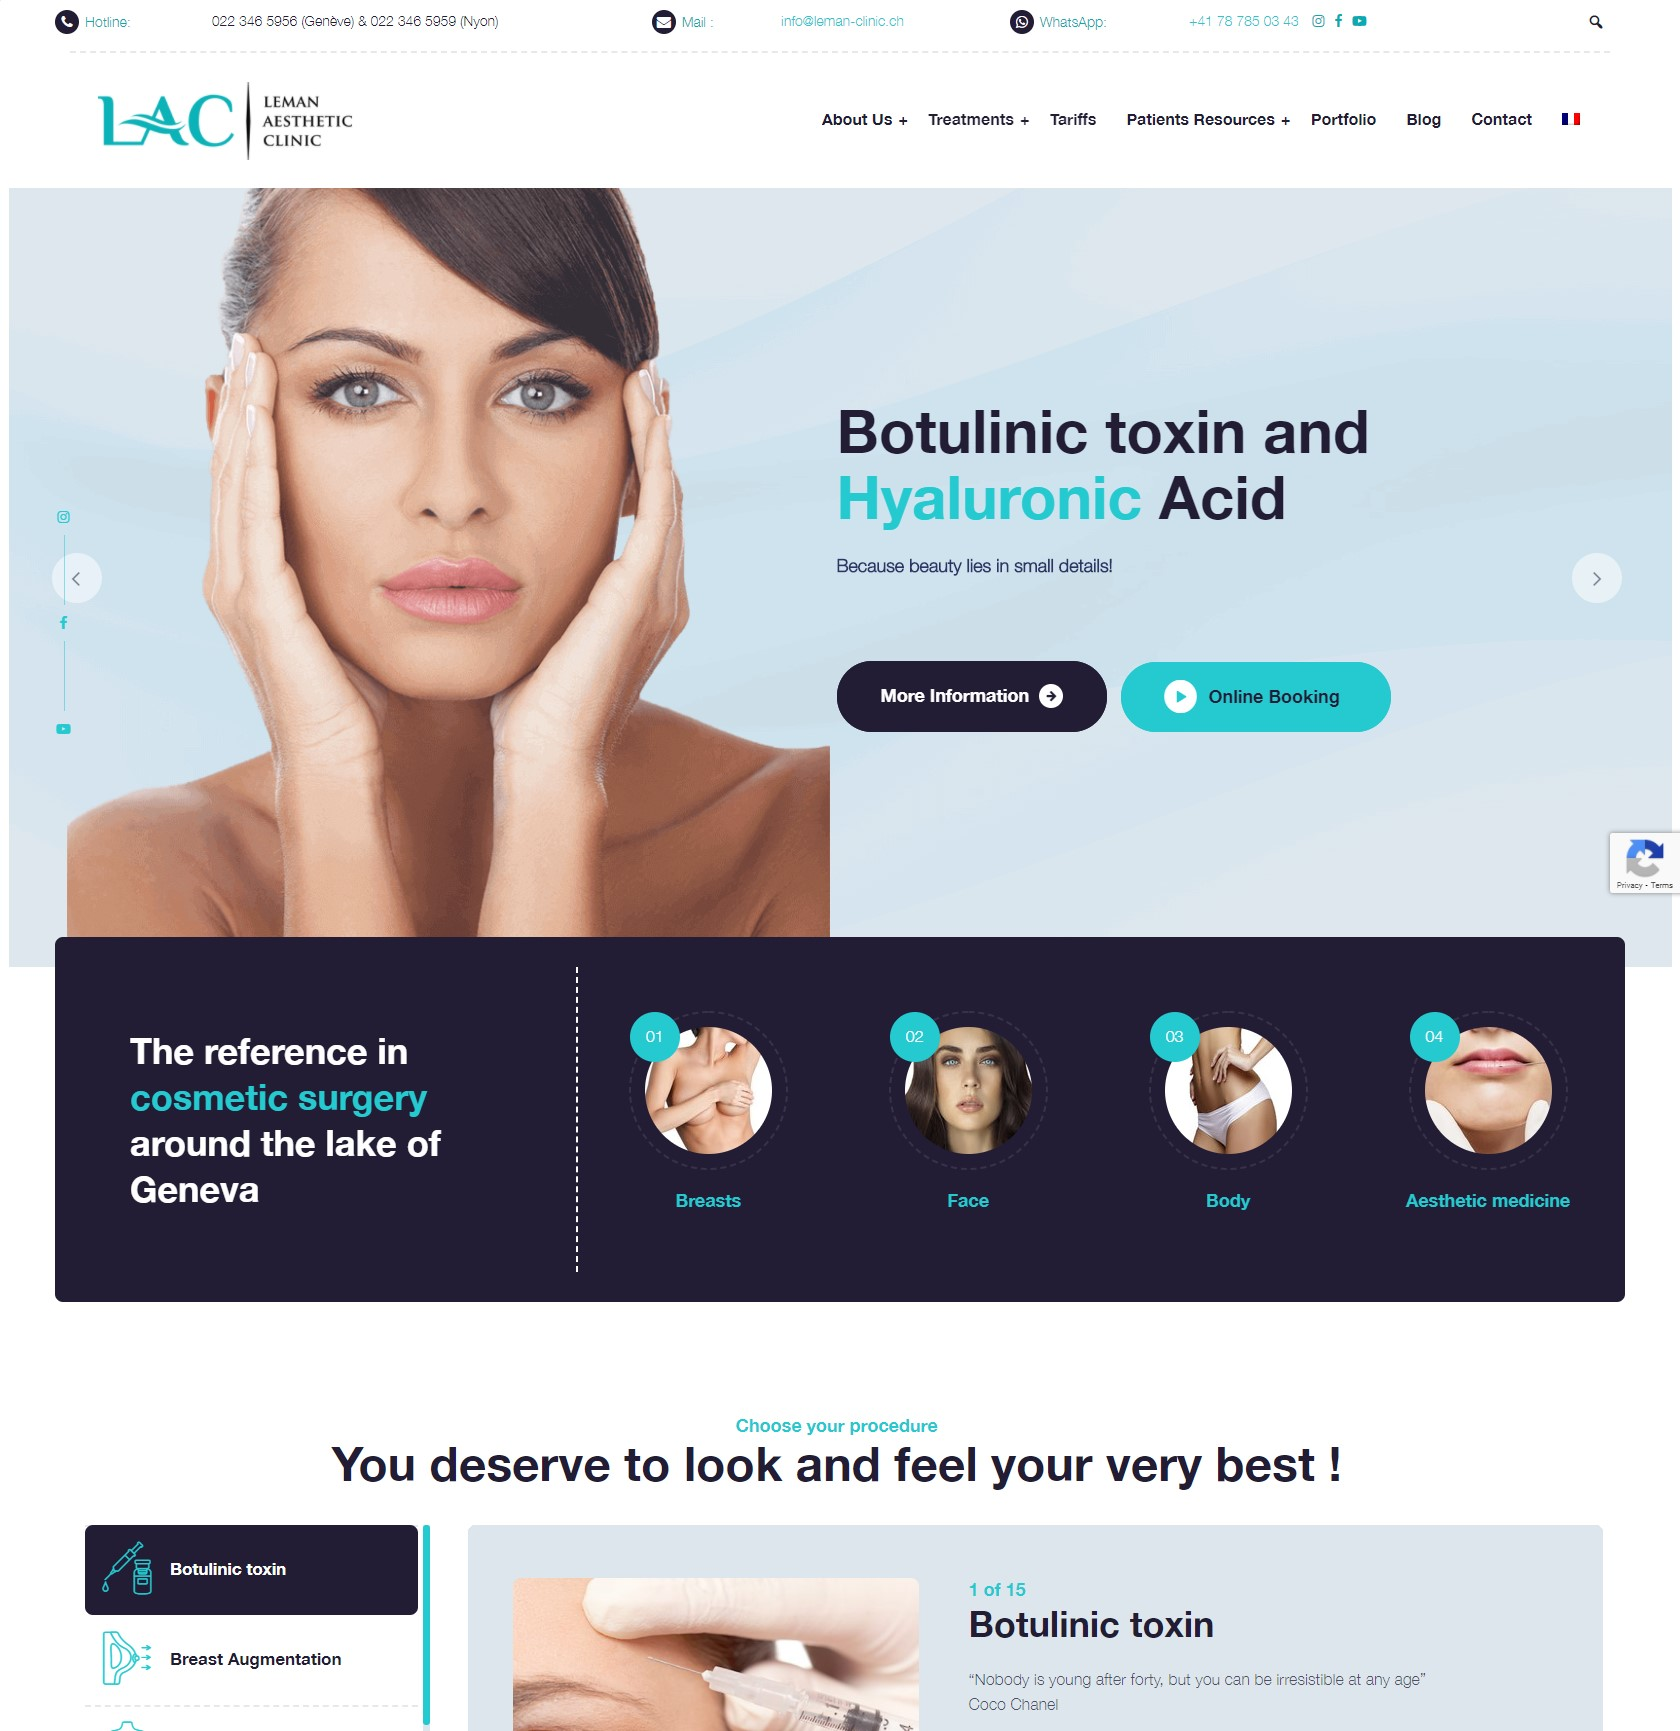 Leman Aesthetic Clinic image